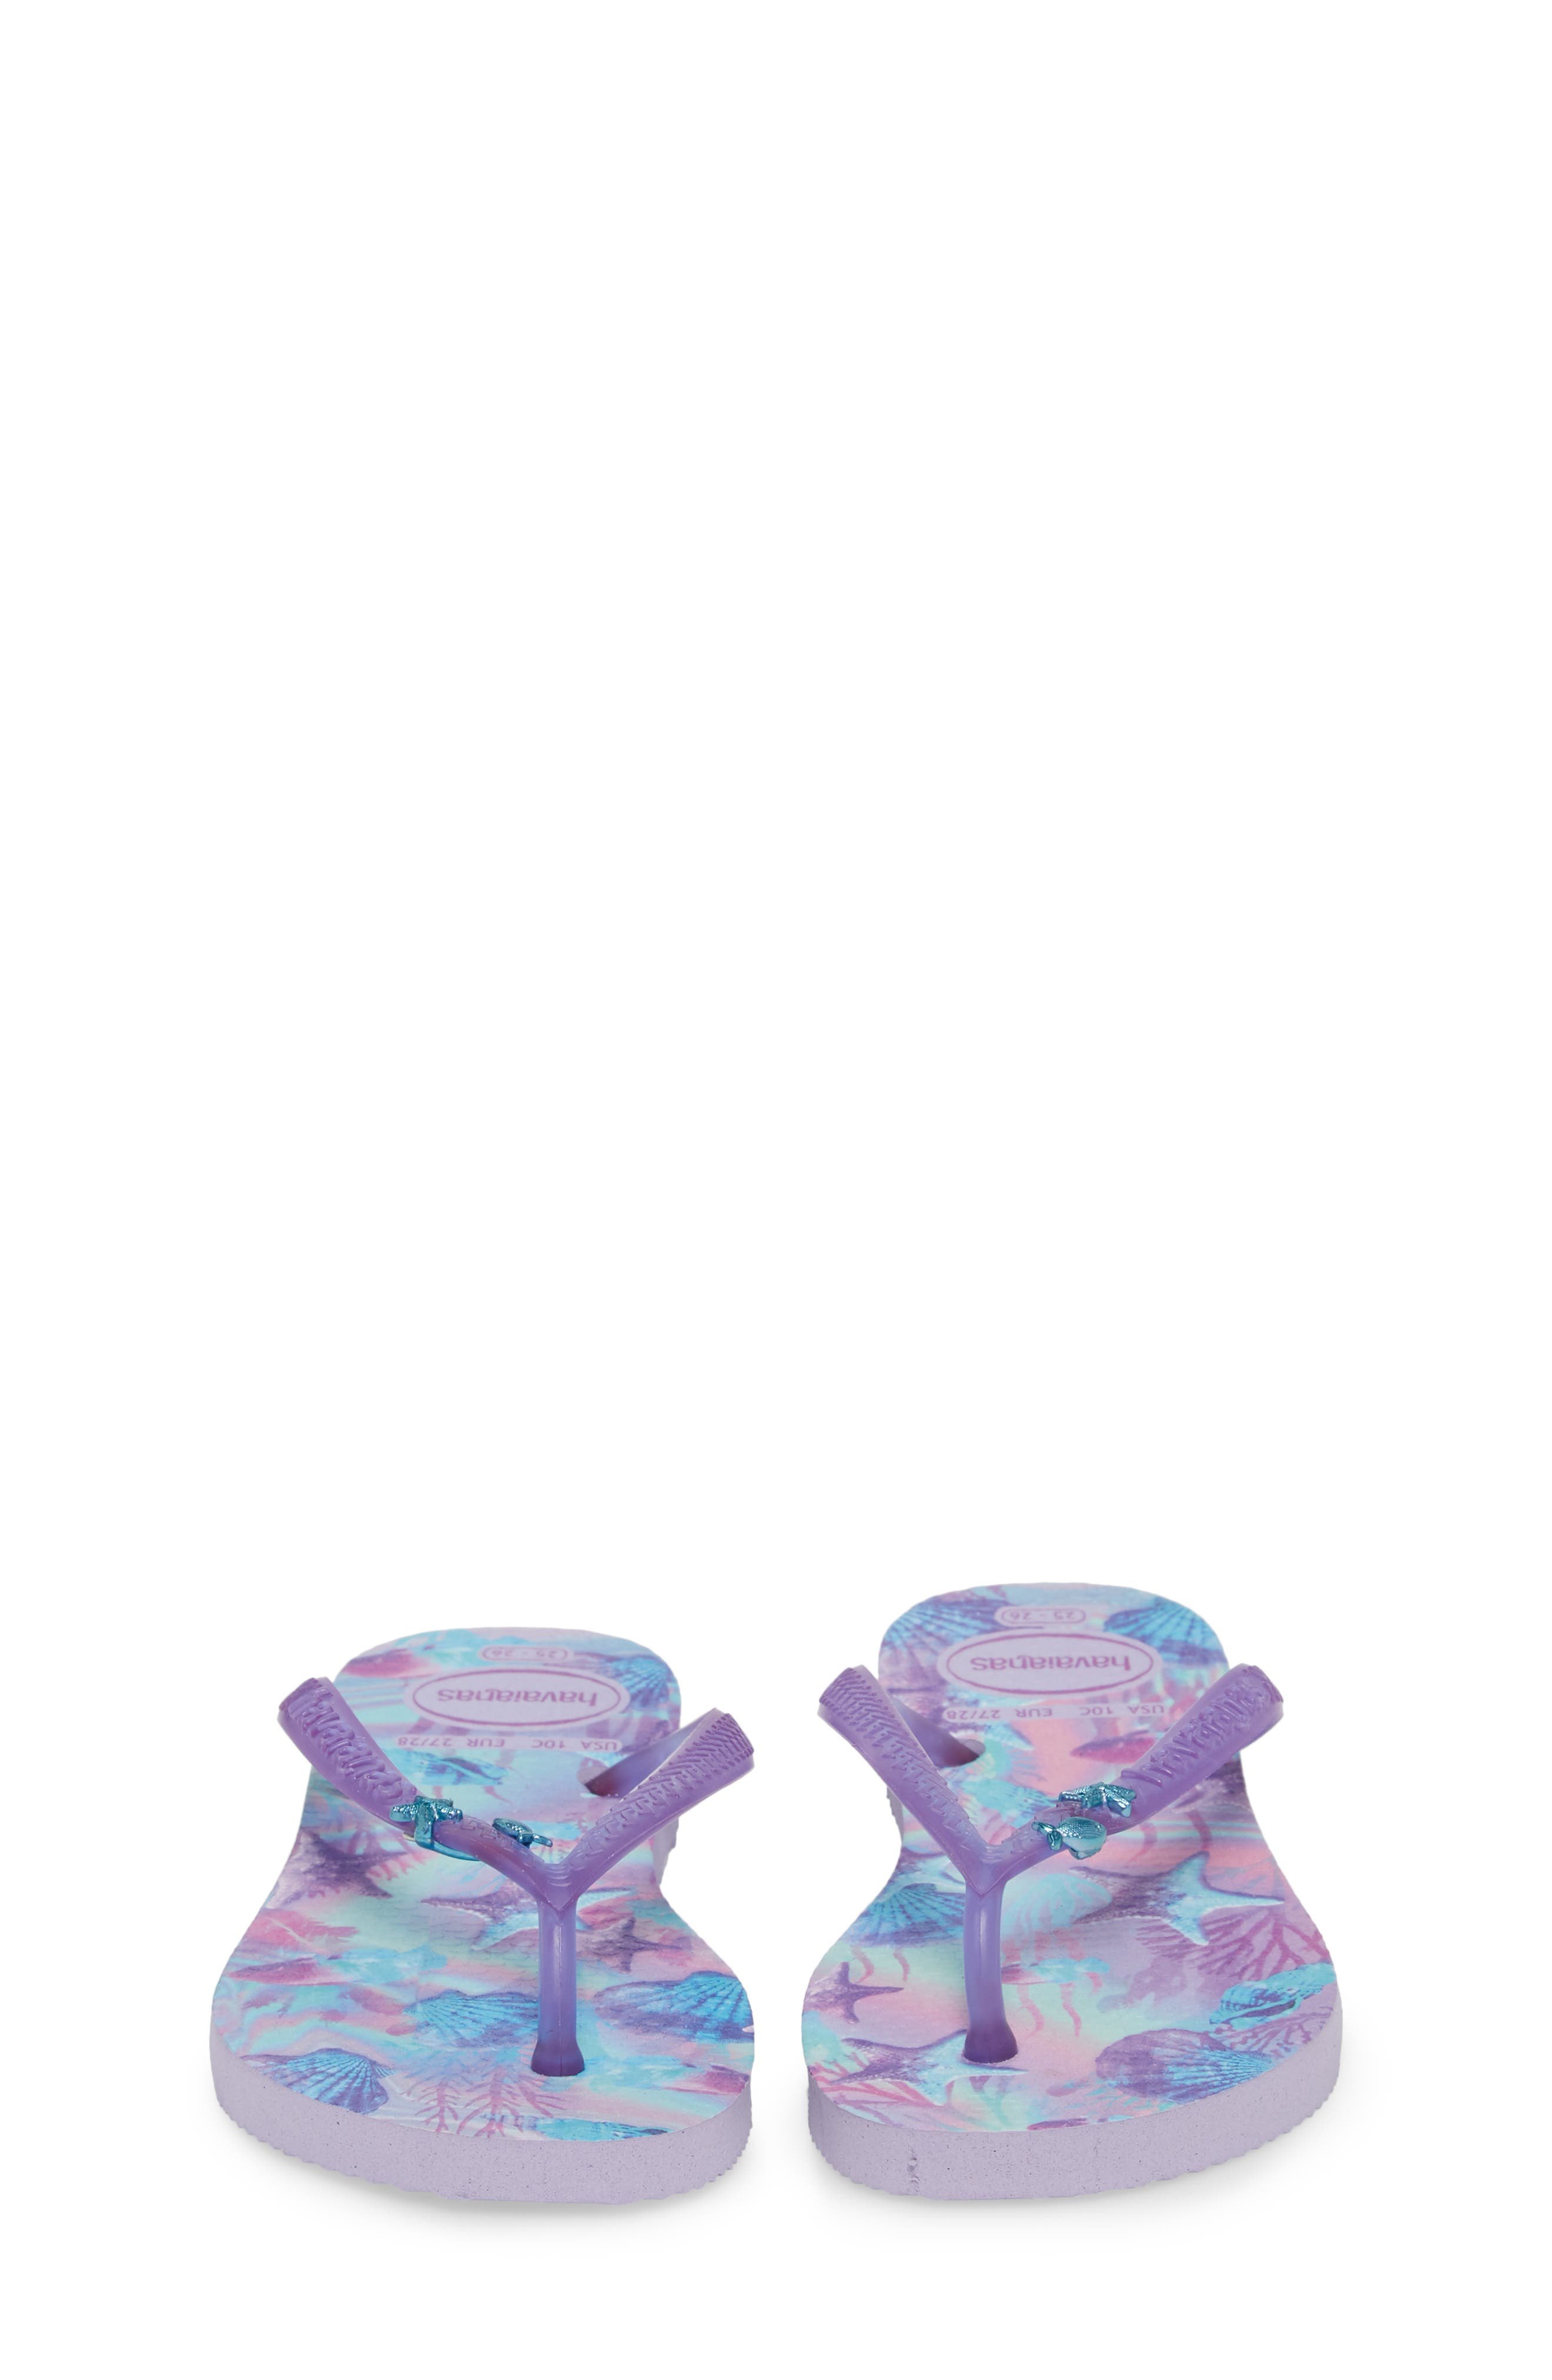 Havianas Slim Summer Flip Flop,                             Alternate thumbnail 5, color,                             Lavender